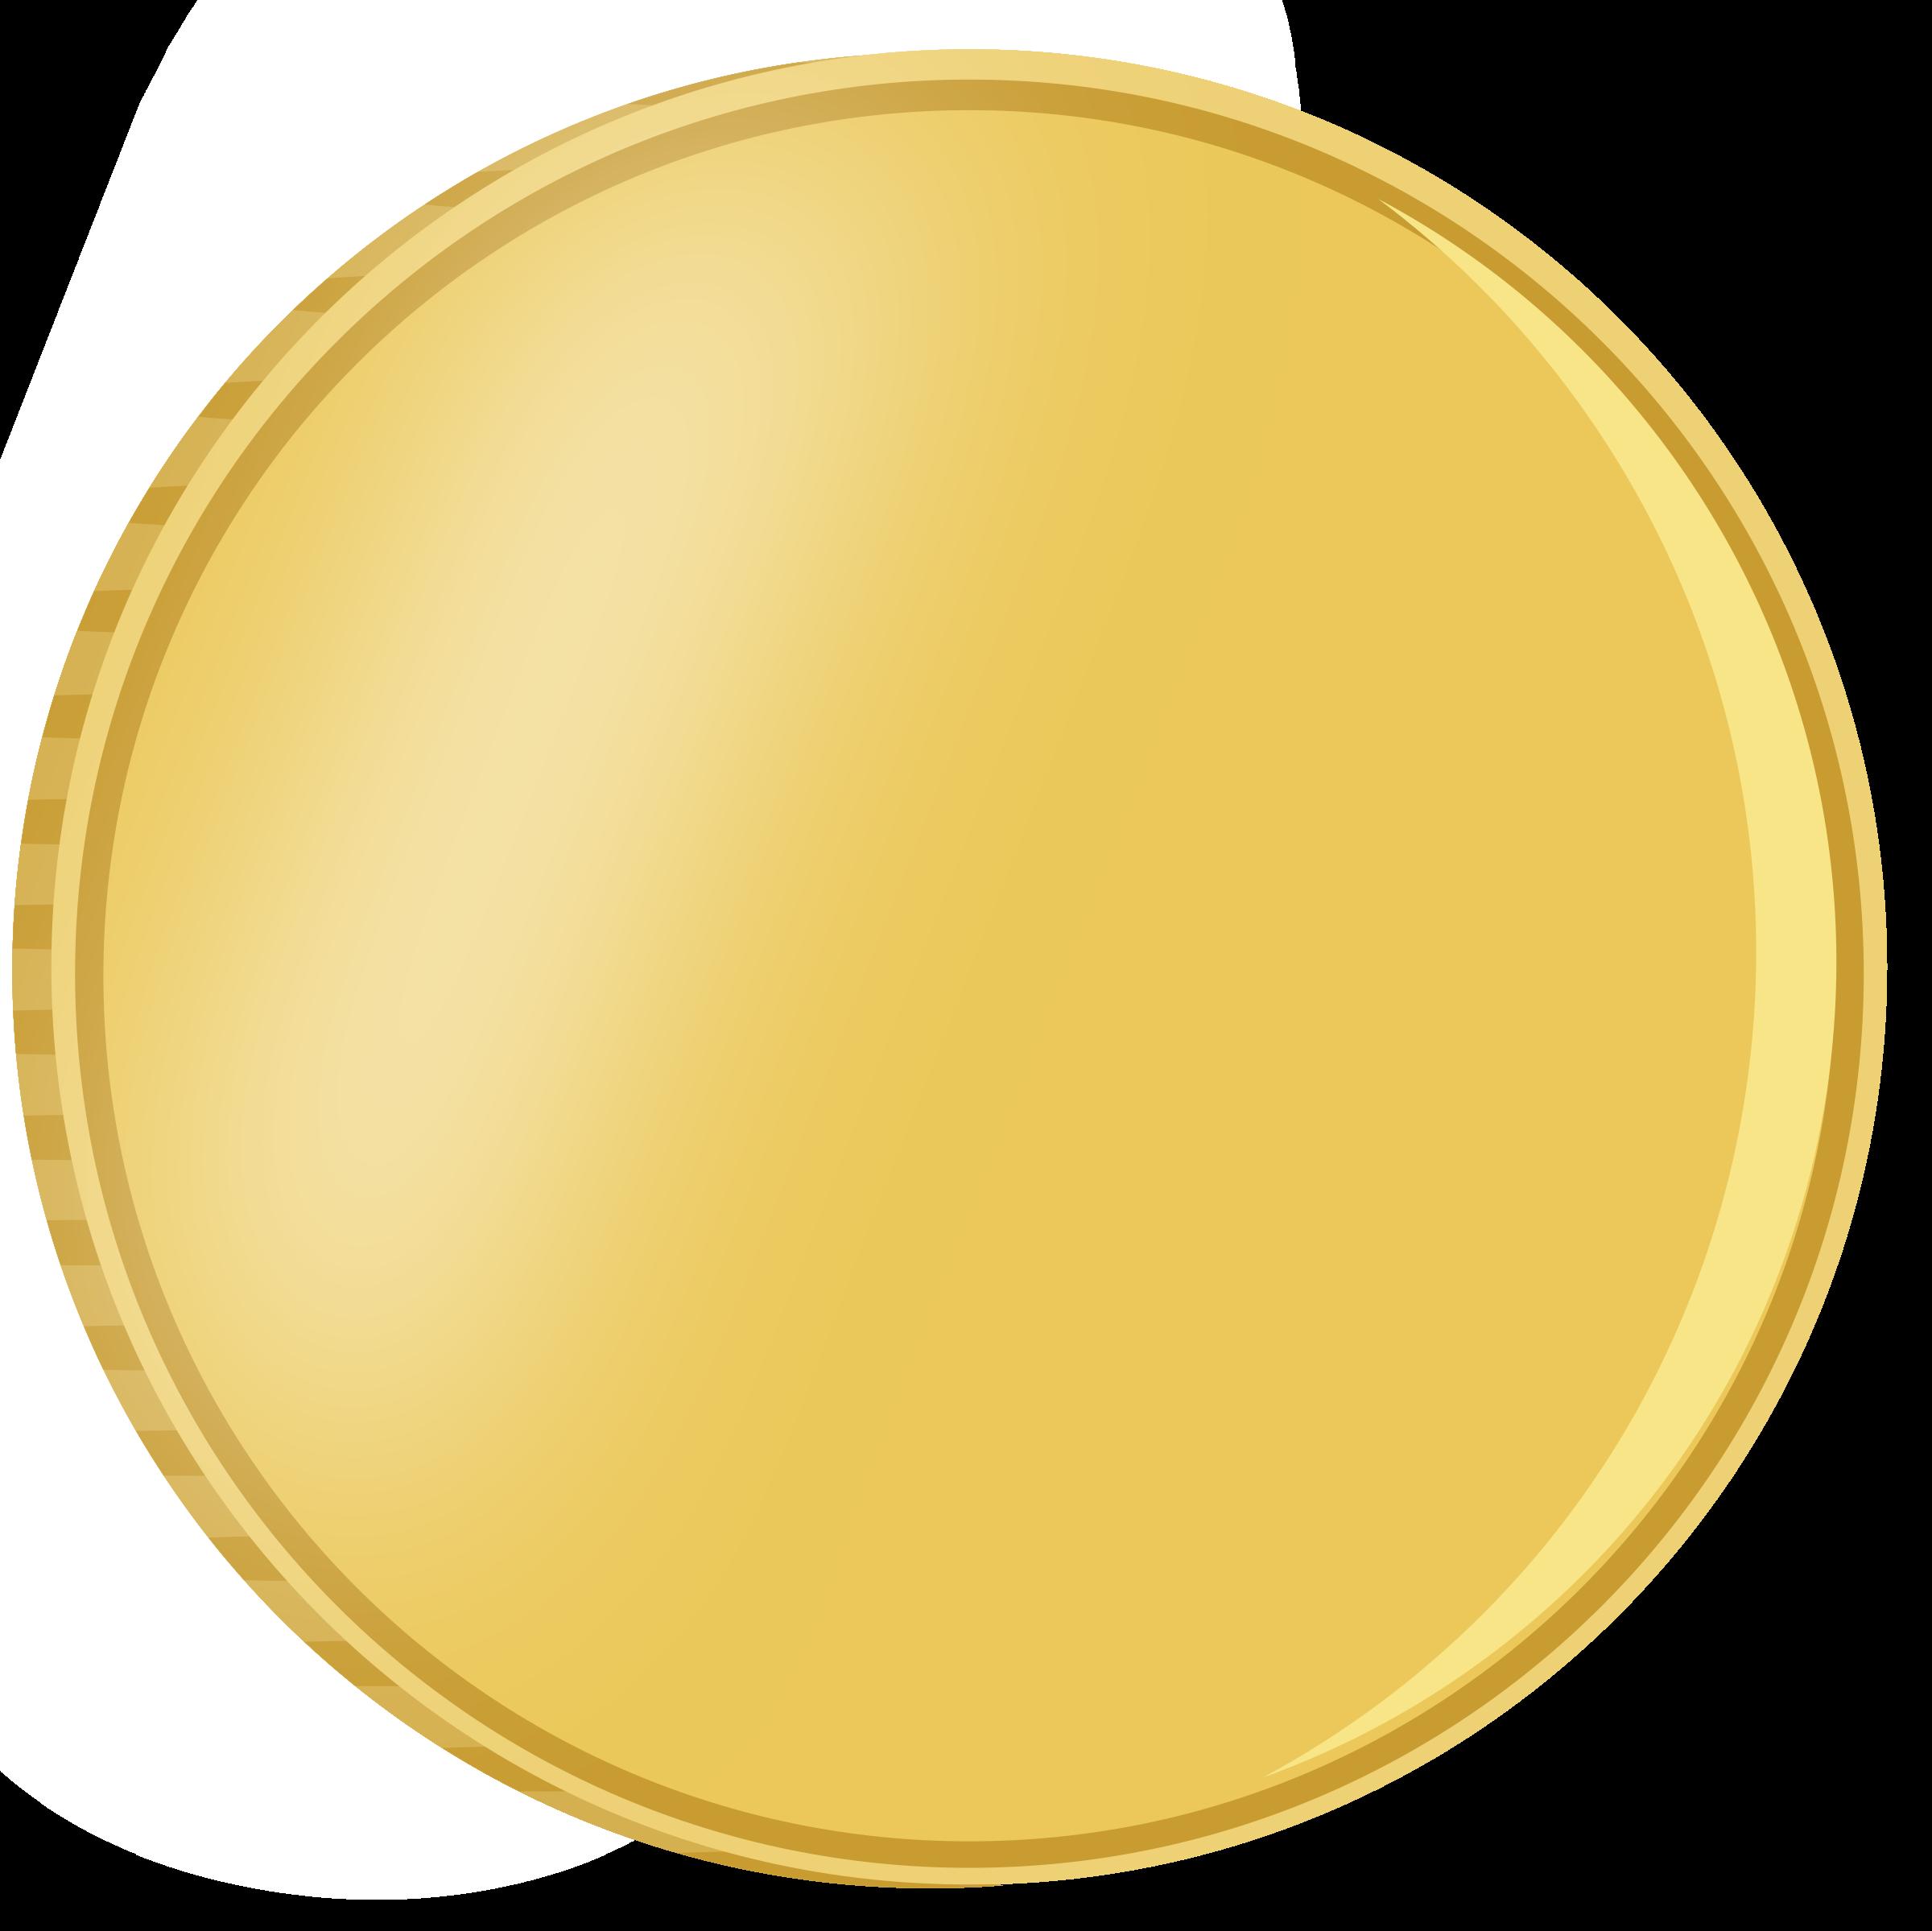 Coins clipart blank coin, Coins blank coin Transparent FREE